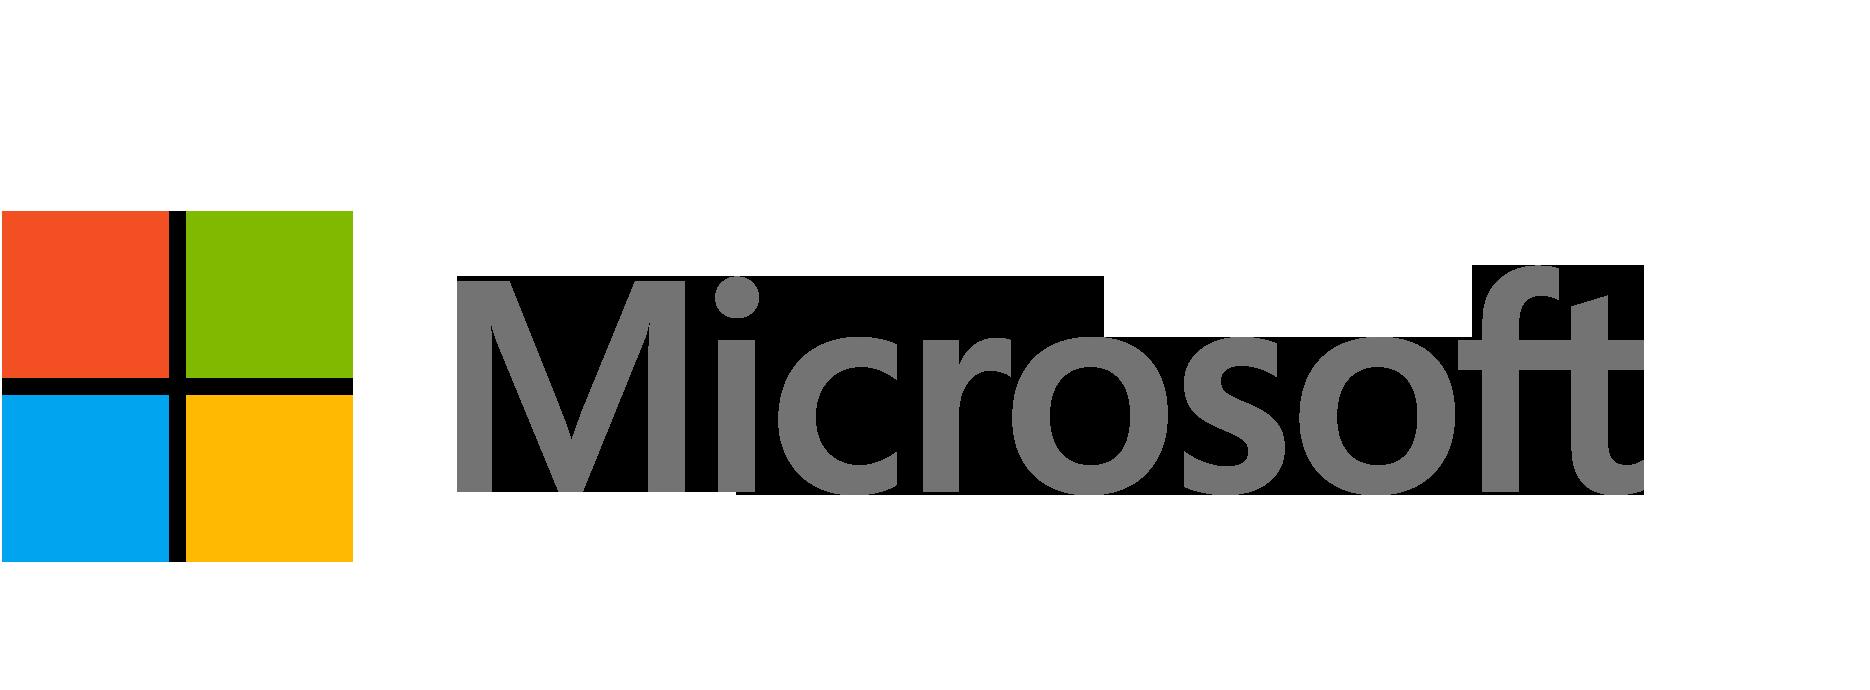 Windows Server RMS CAL - 1 Device CAL - 1 year (DG7GMGF0DVT0)